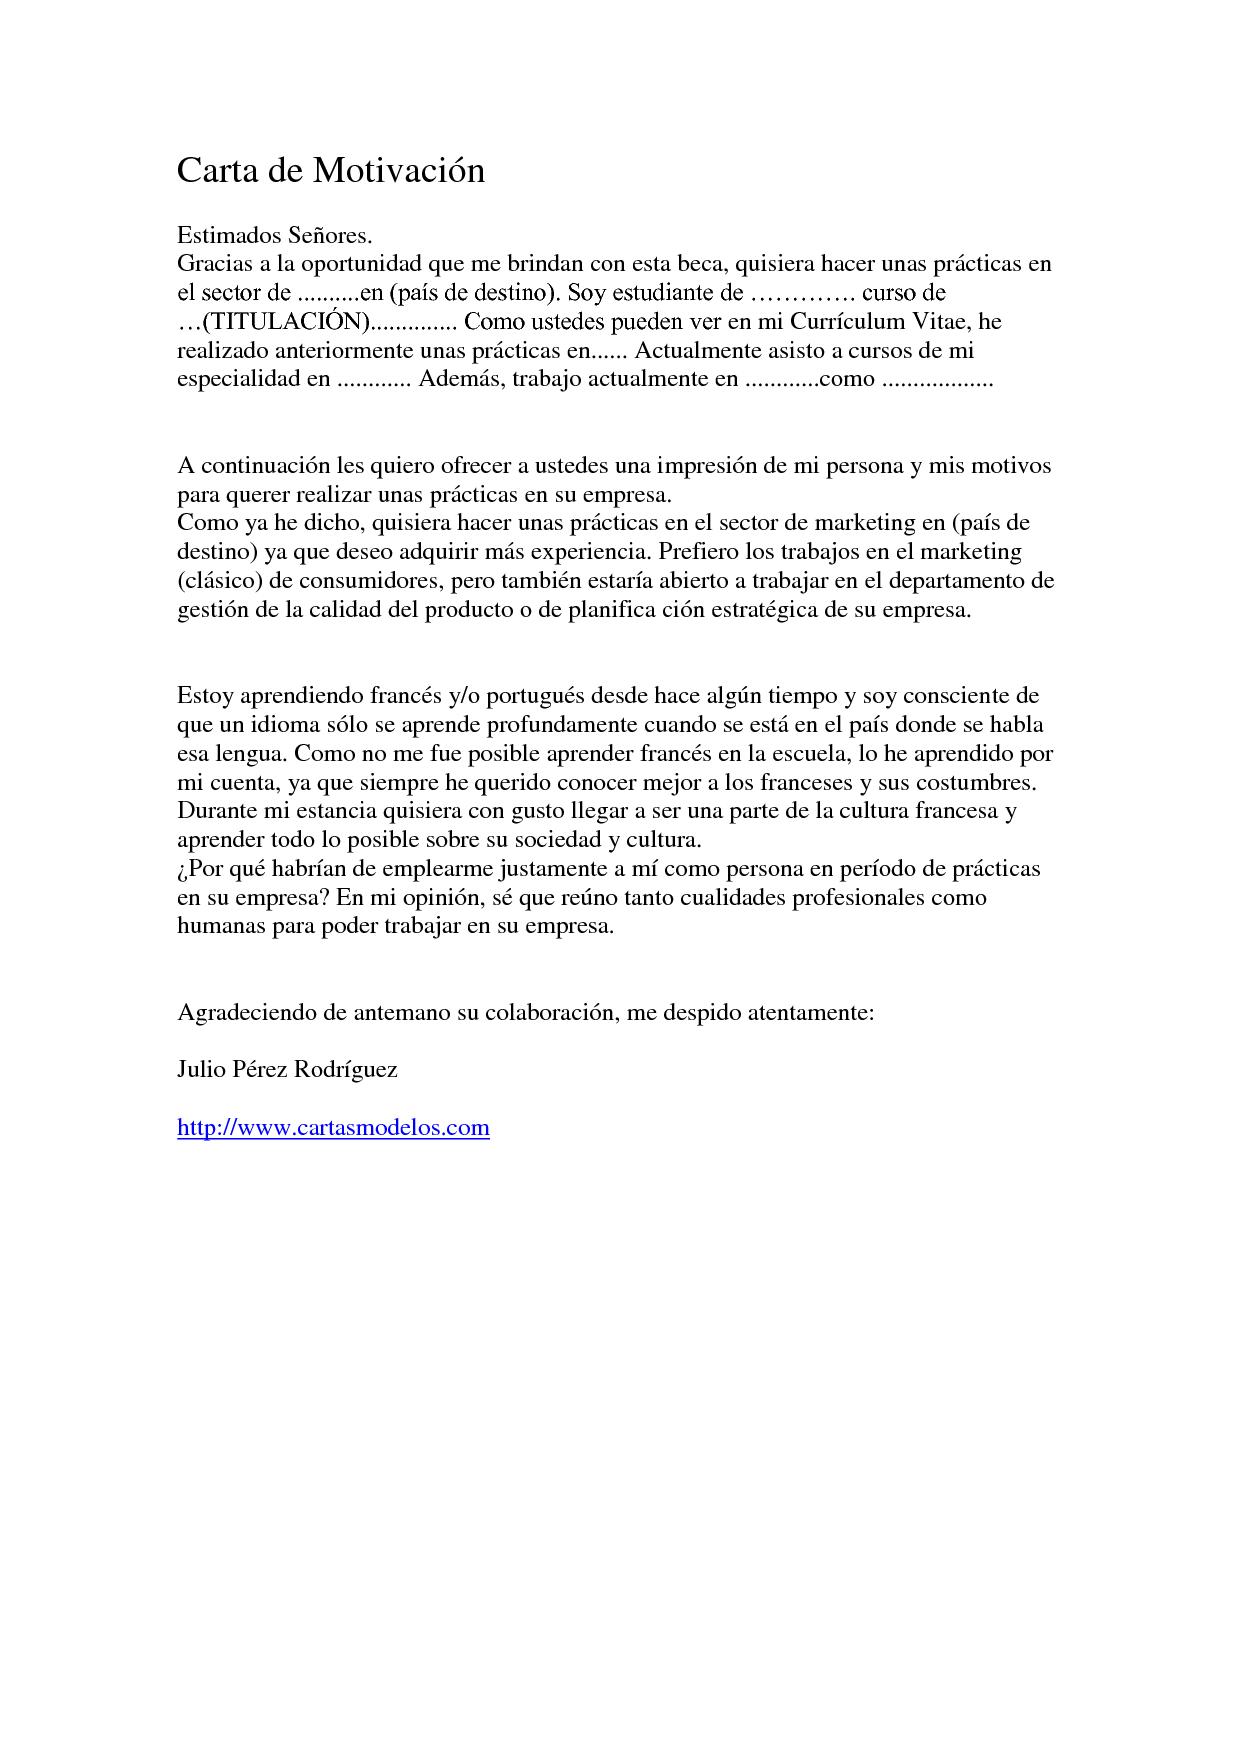 Carta De Motivacion Ejemplos De